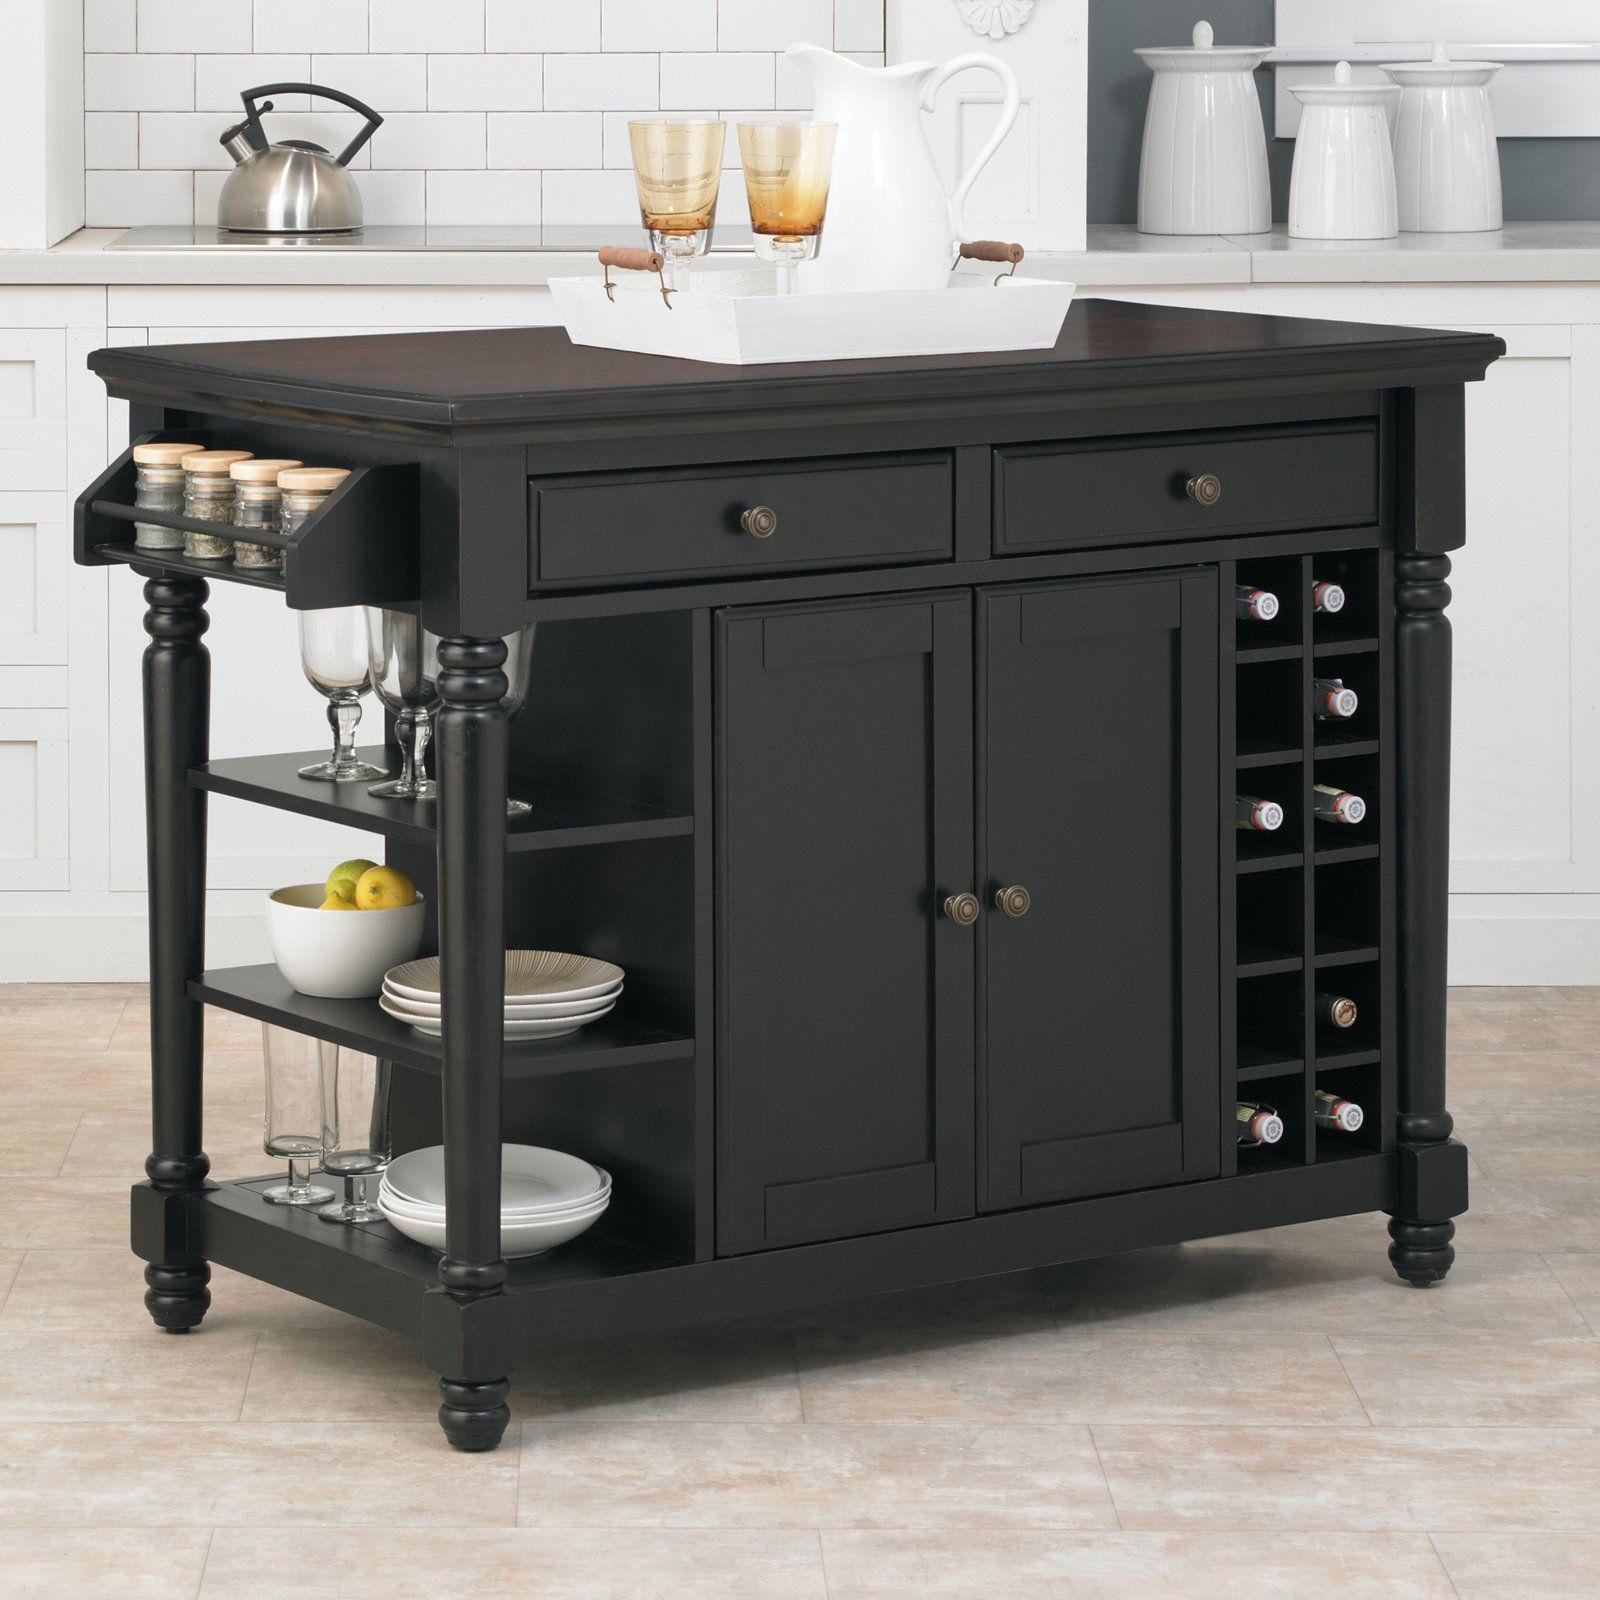 Home Styles Grand Torino Kitchen Island Www Hayneedle Com Kitchen Decor Kitchen Remodel Kitchen Remodel Cost